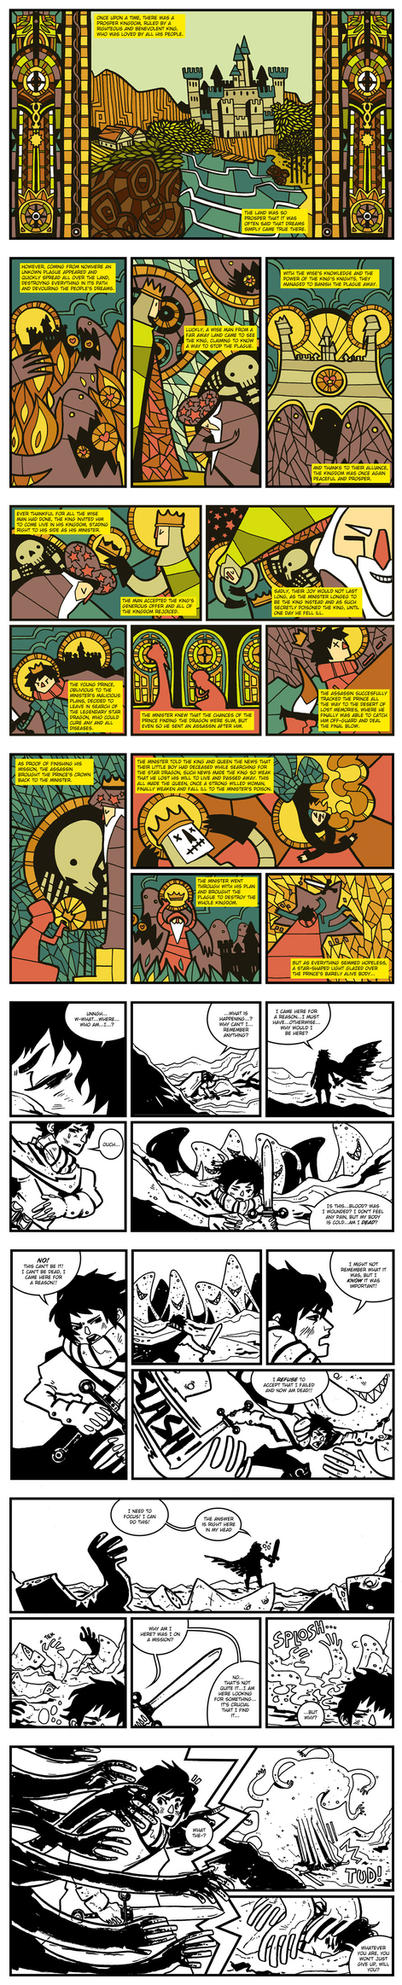 Death Royale part 1 - enterVOID by perca